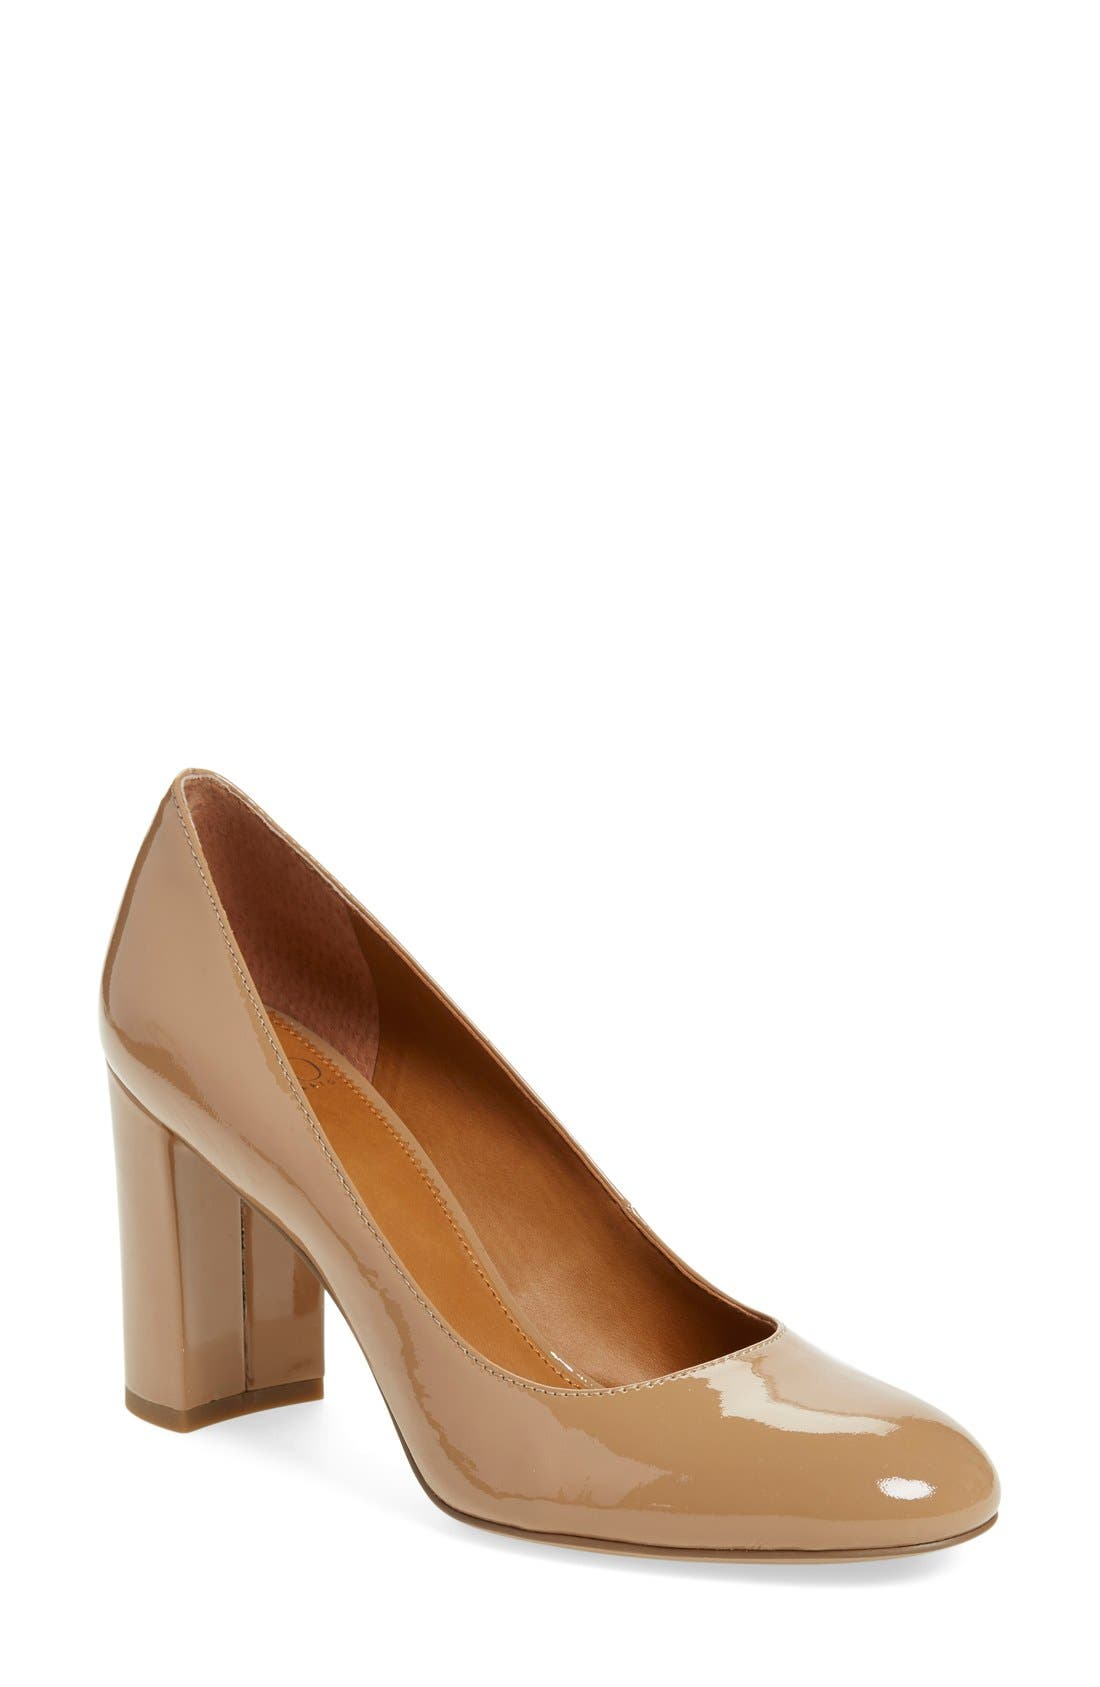 Alternate Image 1 Selected - SARTO by Franco Sarto Aziza Block Heel Pump (Women)